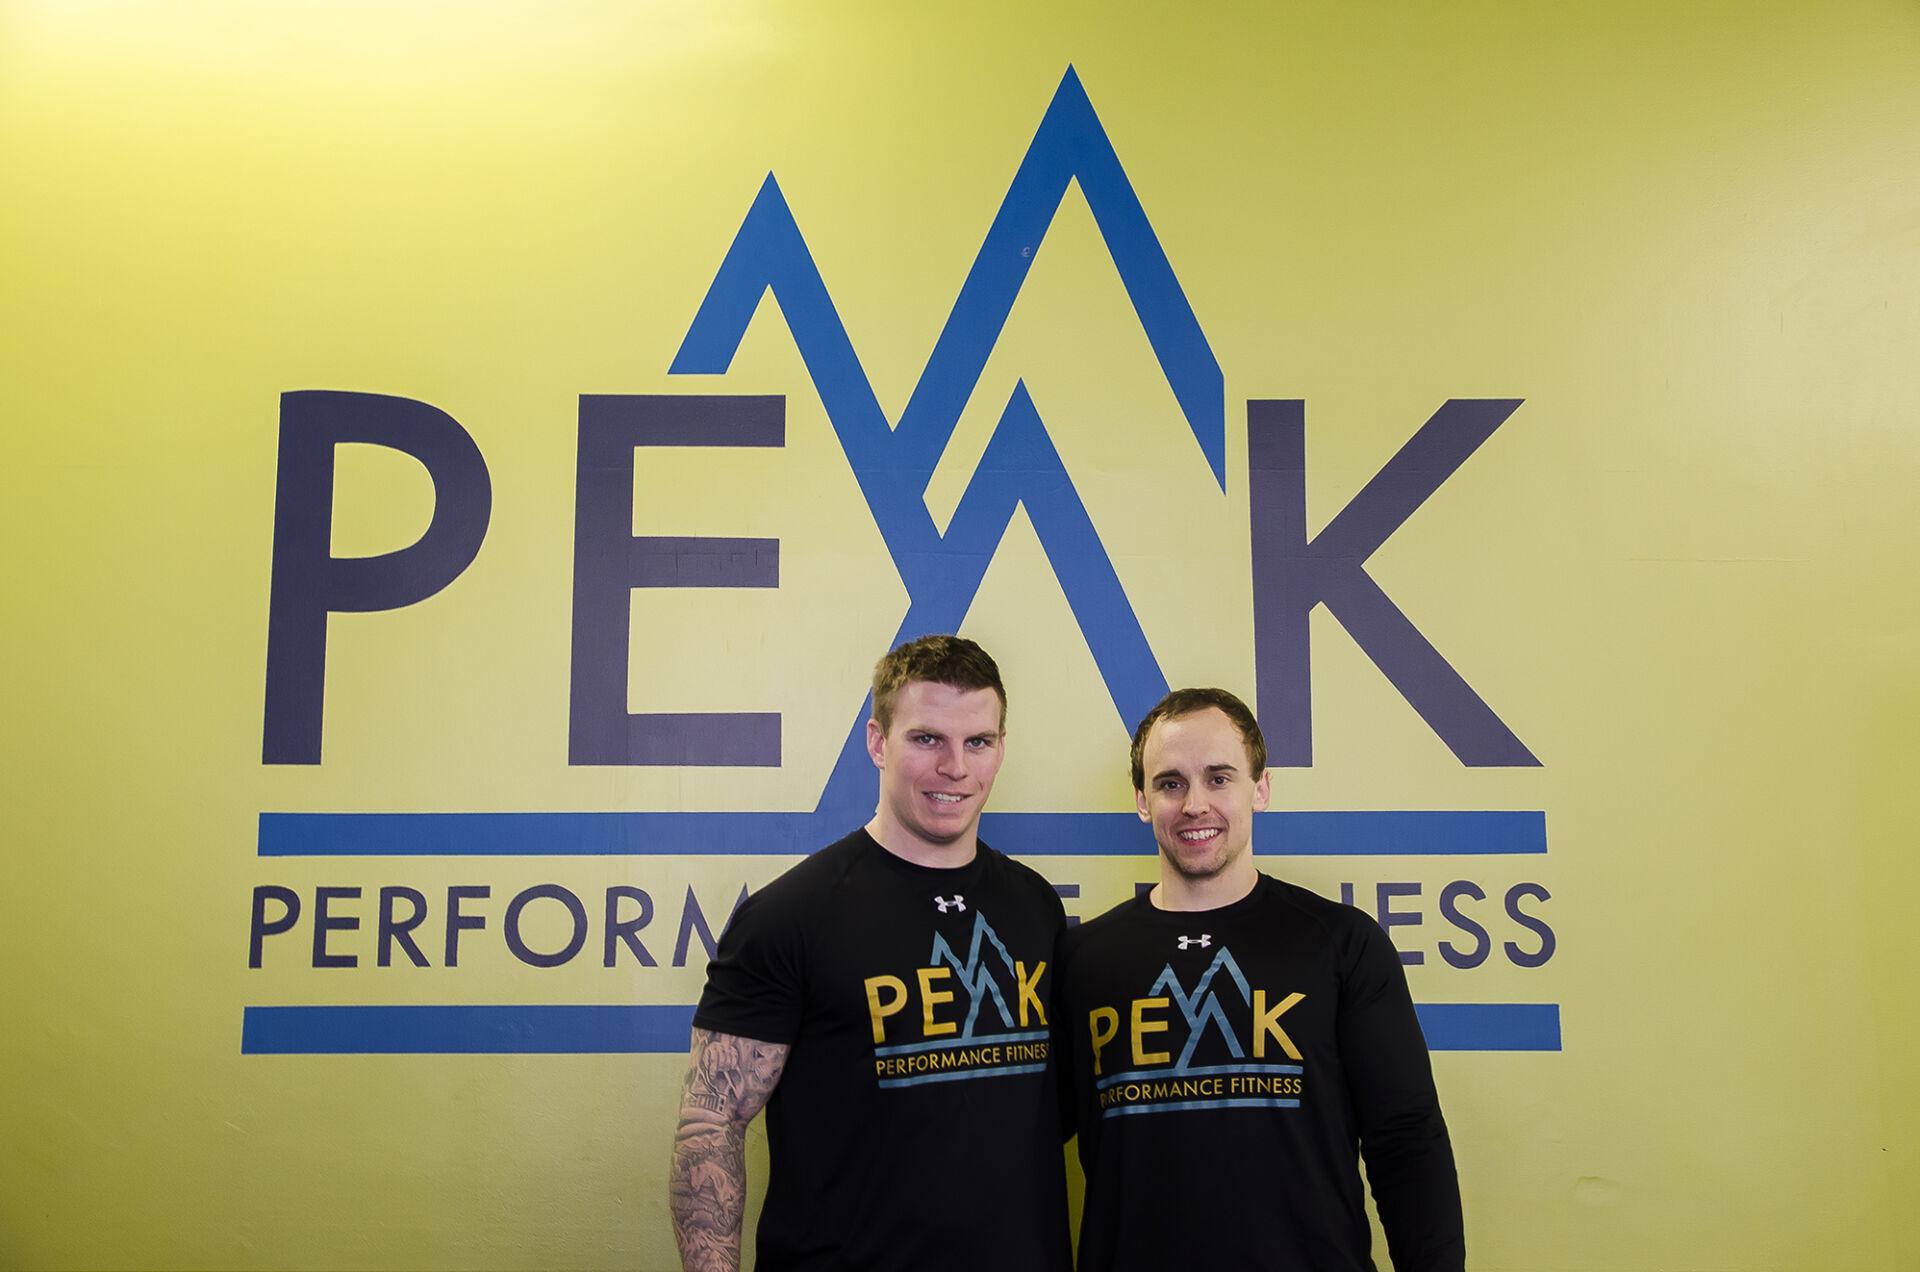 Peak Performance 1 - Strength of CDC helps Peak Performance flex its muscles